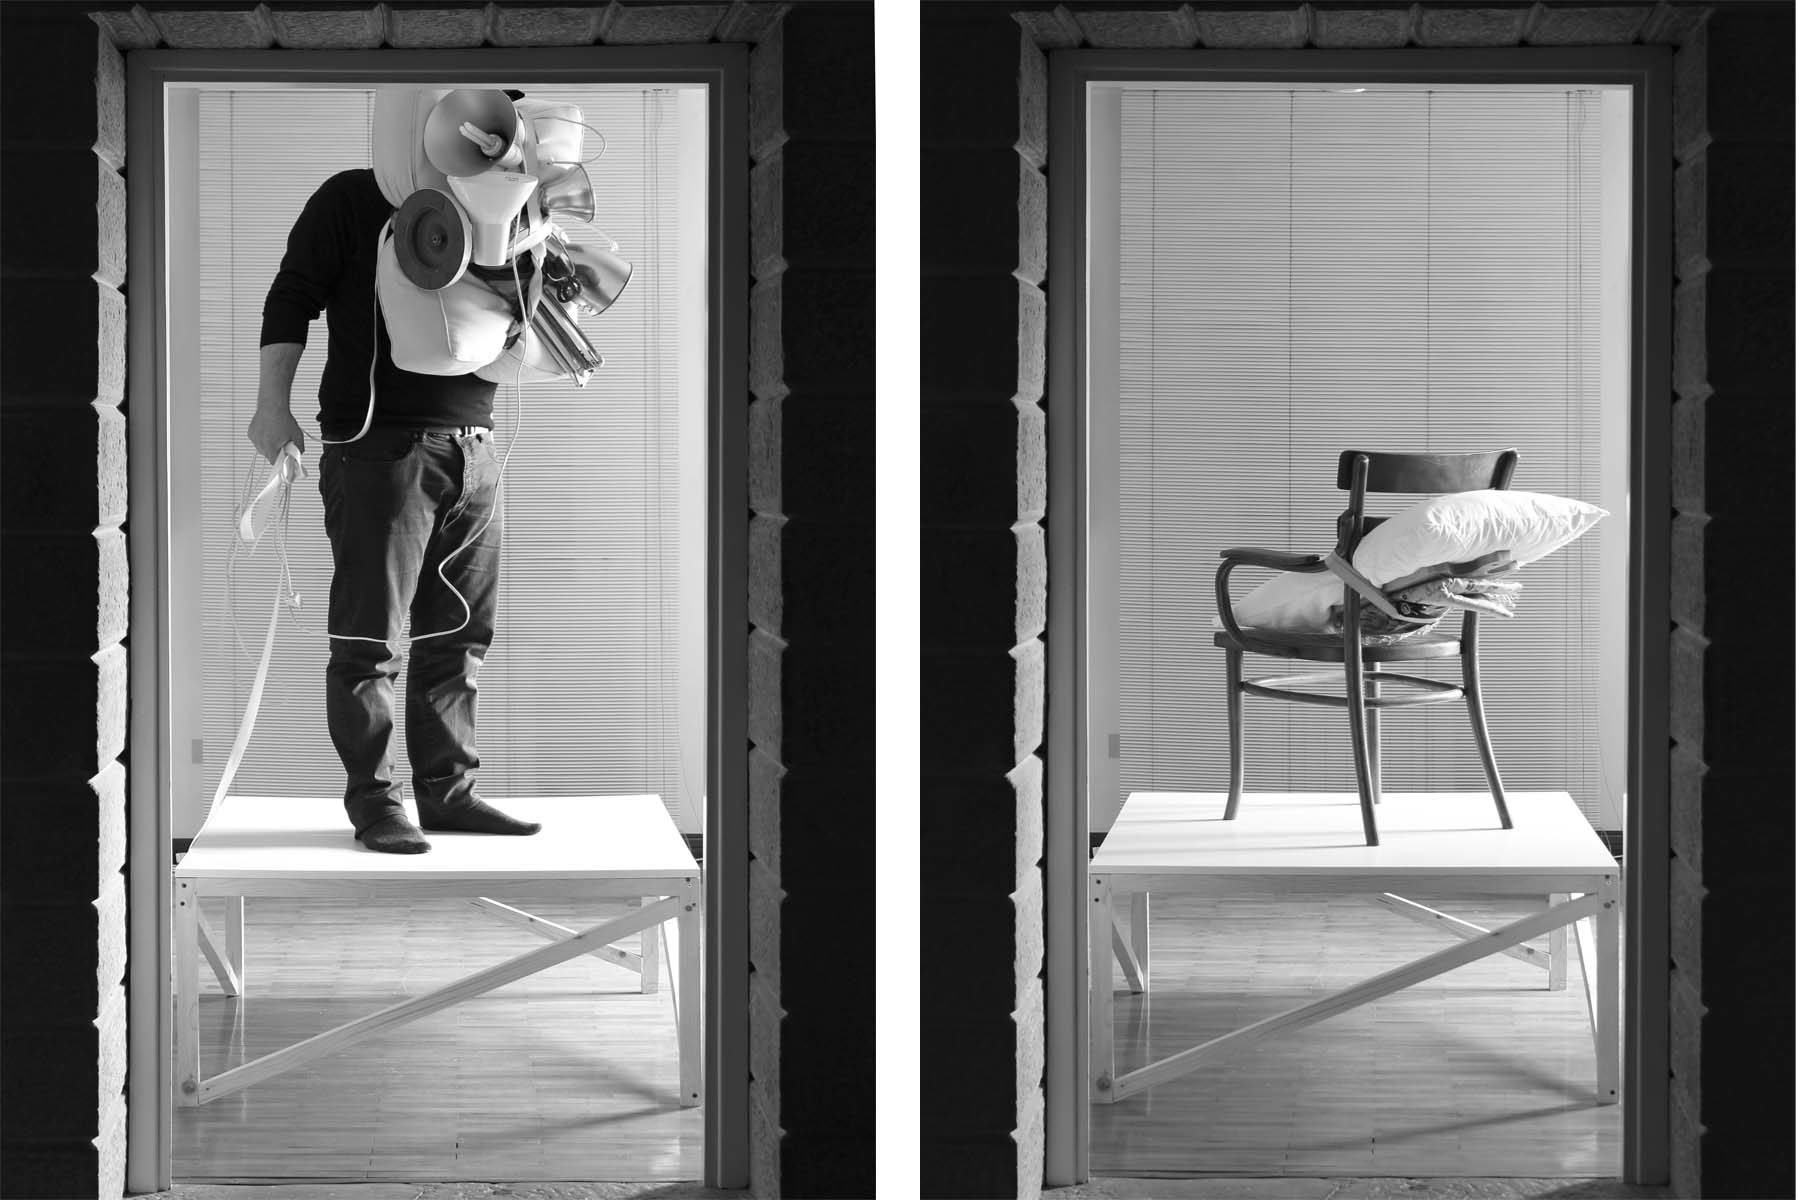 Michele Tajariol, Nothing is hidden, 2014, stampa fineart su carta fotografica, 31 x 43 cm ciascuno